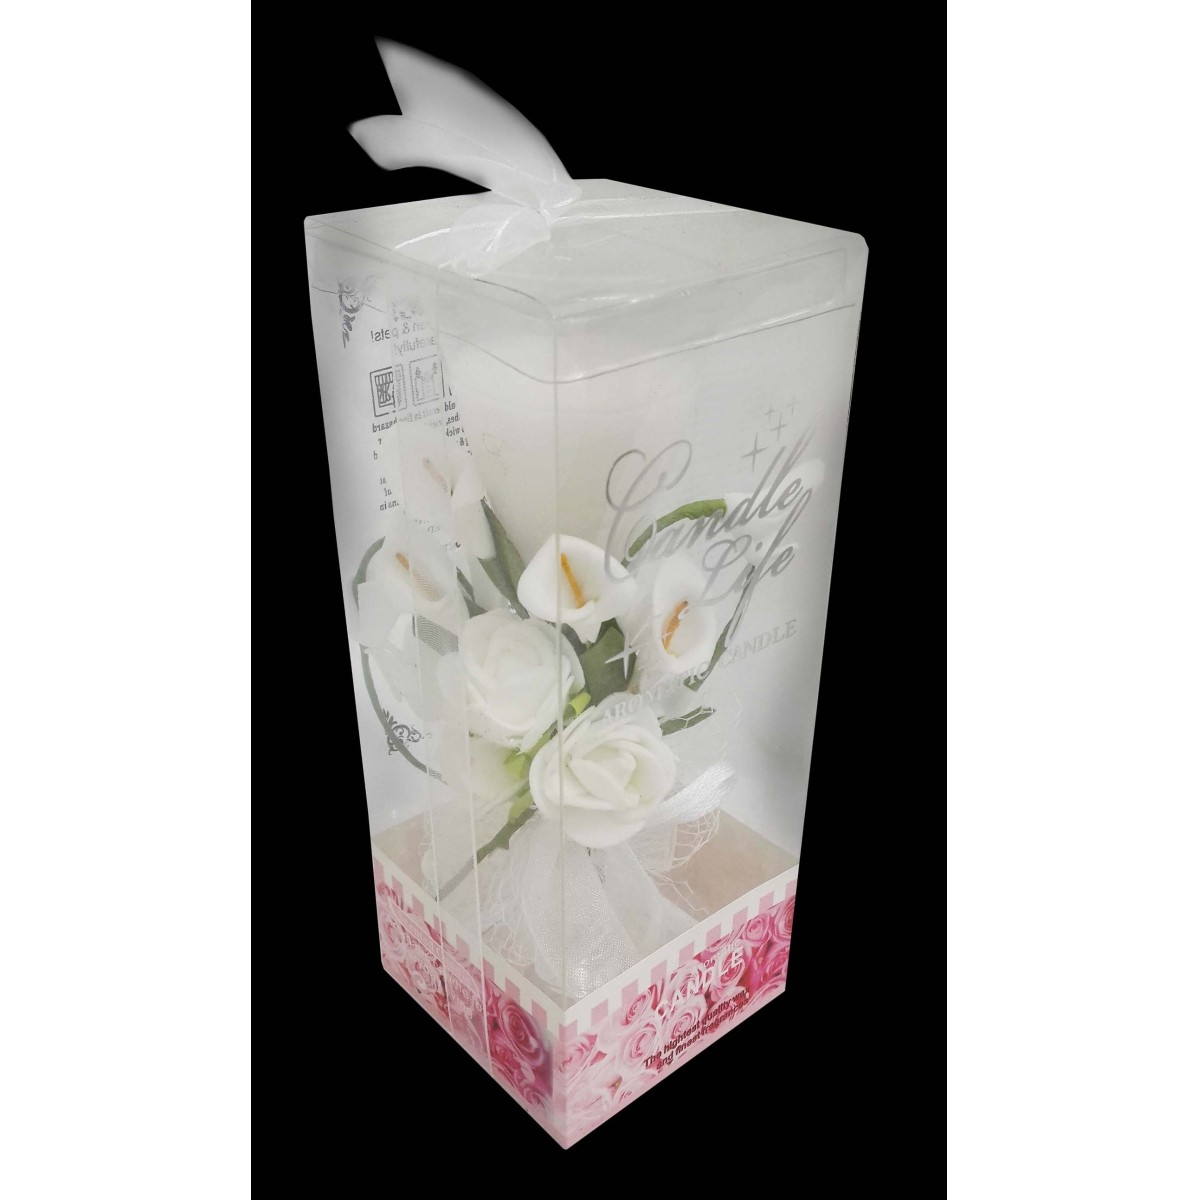 Vela Decorativa Mini 15 Anos Festa Flor Enfeite 24 Unidades Branca Kit 24 Unidades (WL-C)